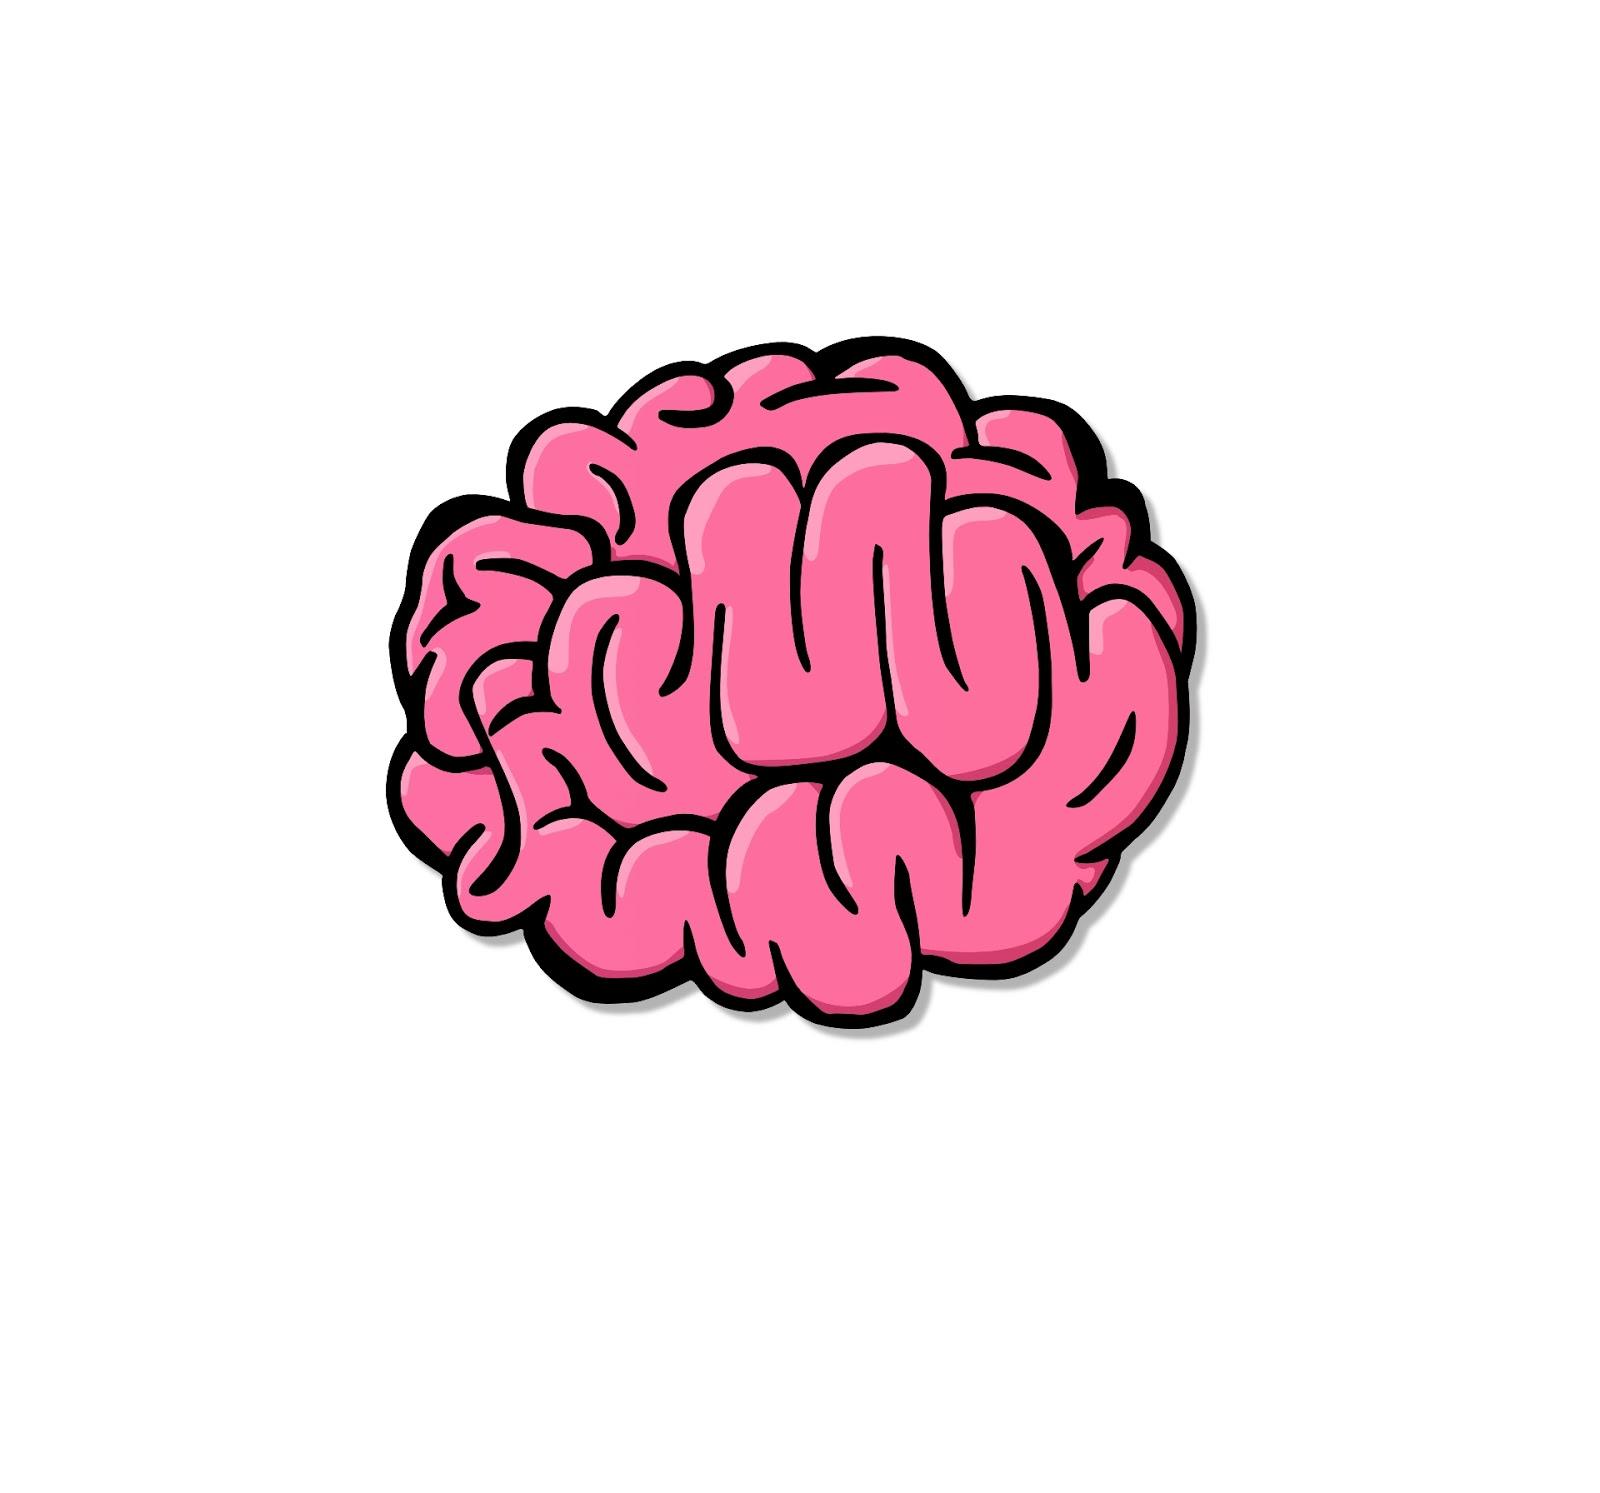 Brain Jack Image: Brain Cartoon